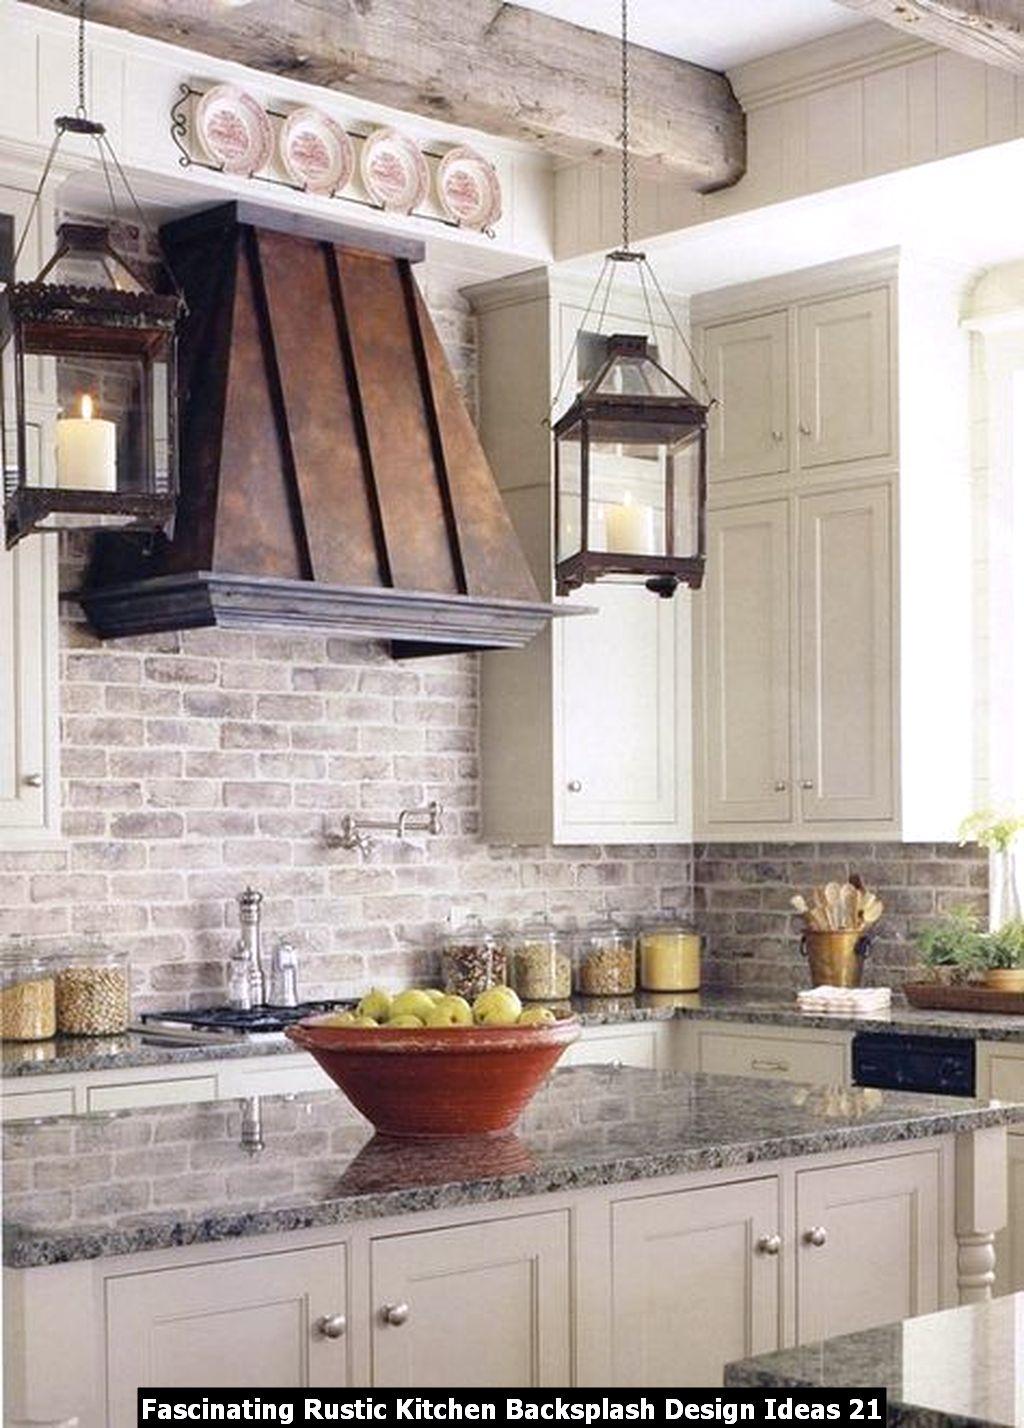 Fascinating Rustic Kitchen Backsplash Design Ideas 21